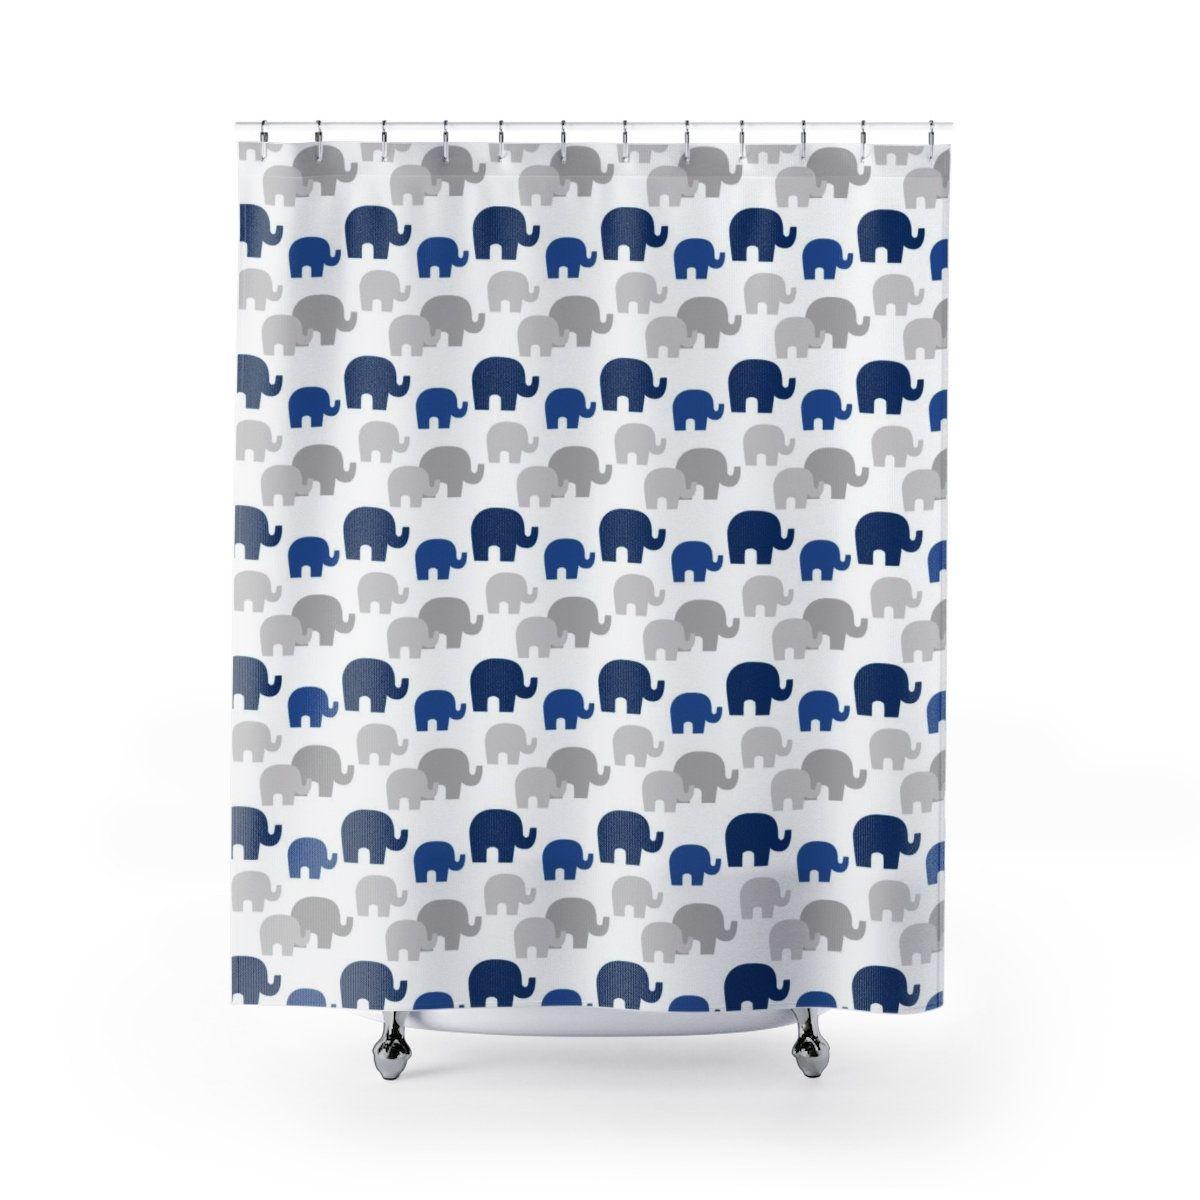 Navy Blue Elephant Shower Curtains Kids Boys Bathroom Bathtub Etsy In 2020 Kids Shower Curtain Elephant Shower Curtains Kids Bathroom Boys